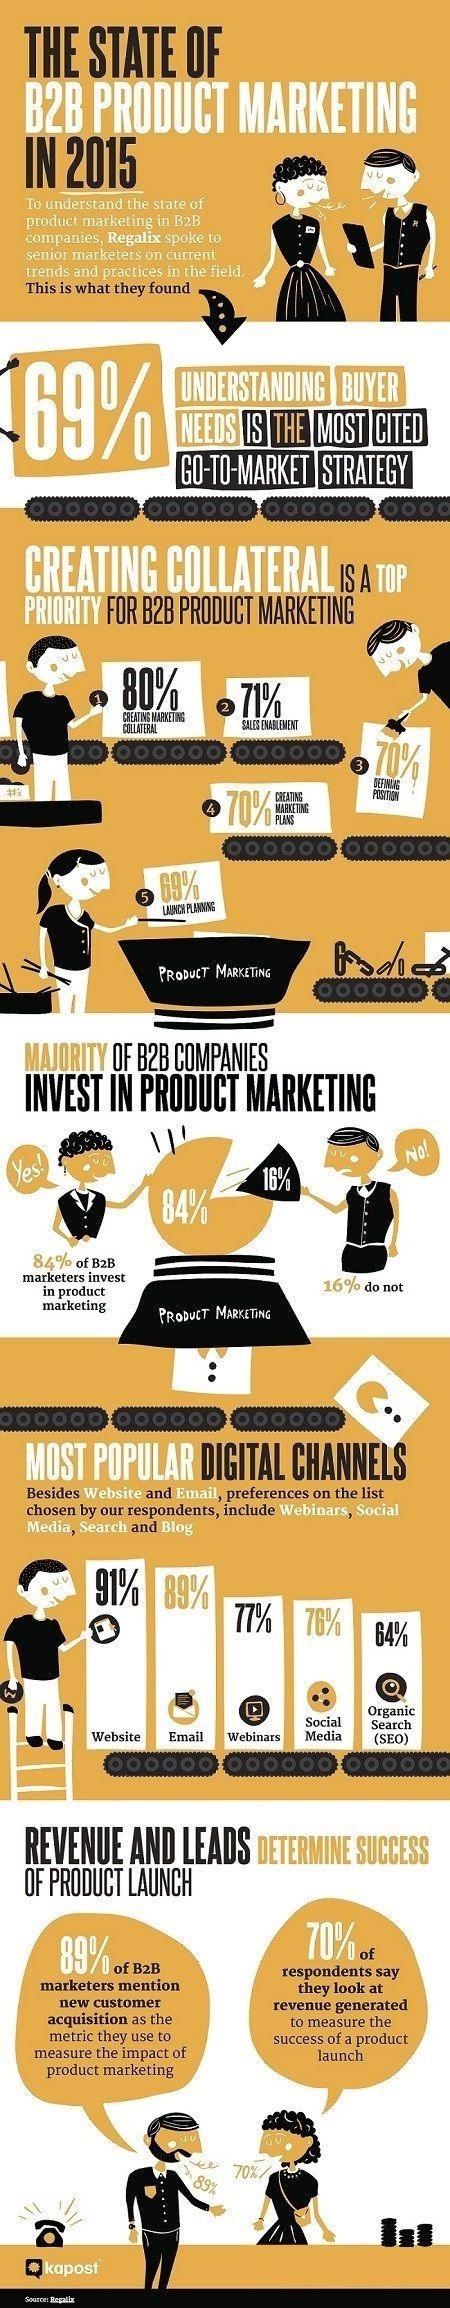 A B2B digitális marketing helyzete 2015-ben - Marketing - DigitalHungary